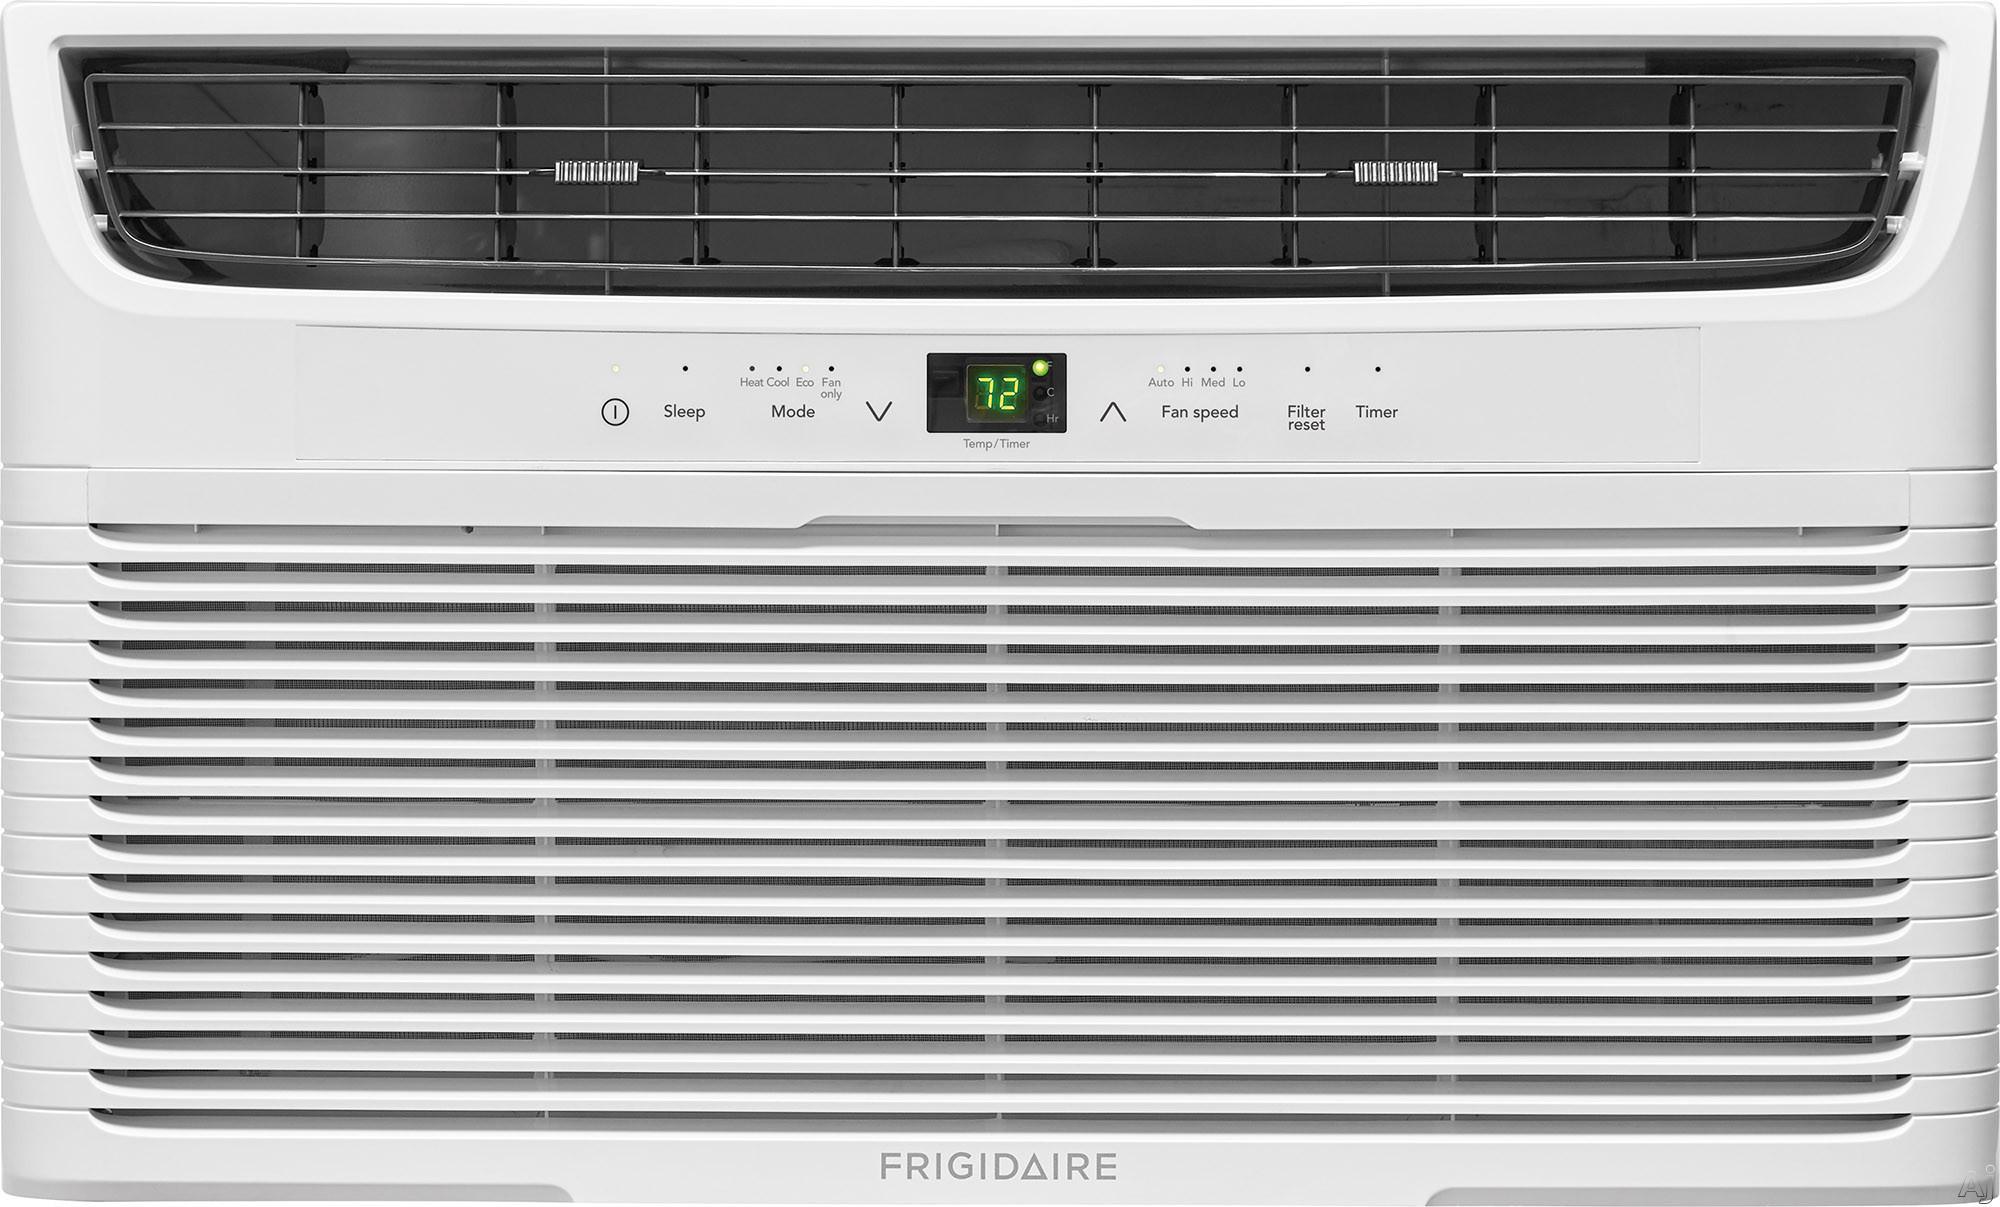 "Frigidaire FFTH1422U2 14,000 BTU Room Air Conditioner with Supplemental Heating Option, Effortlessâ""¢ Remote Temperature Control, Programmable 24-Hour Timer, Effortlessâ""¢ Clean Filter, Effort"